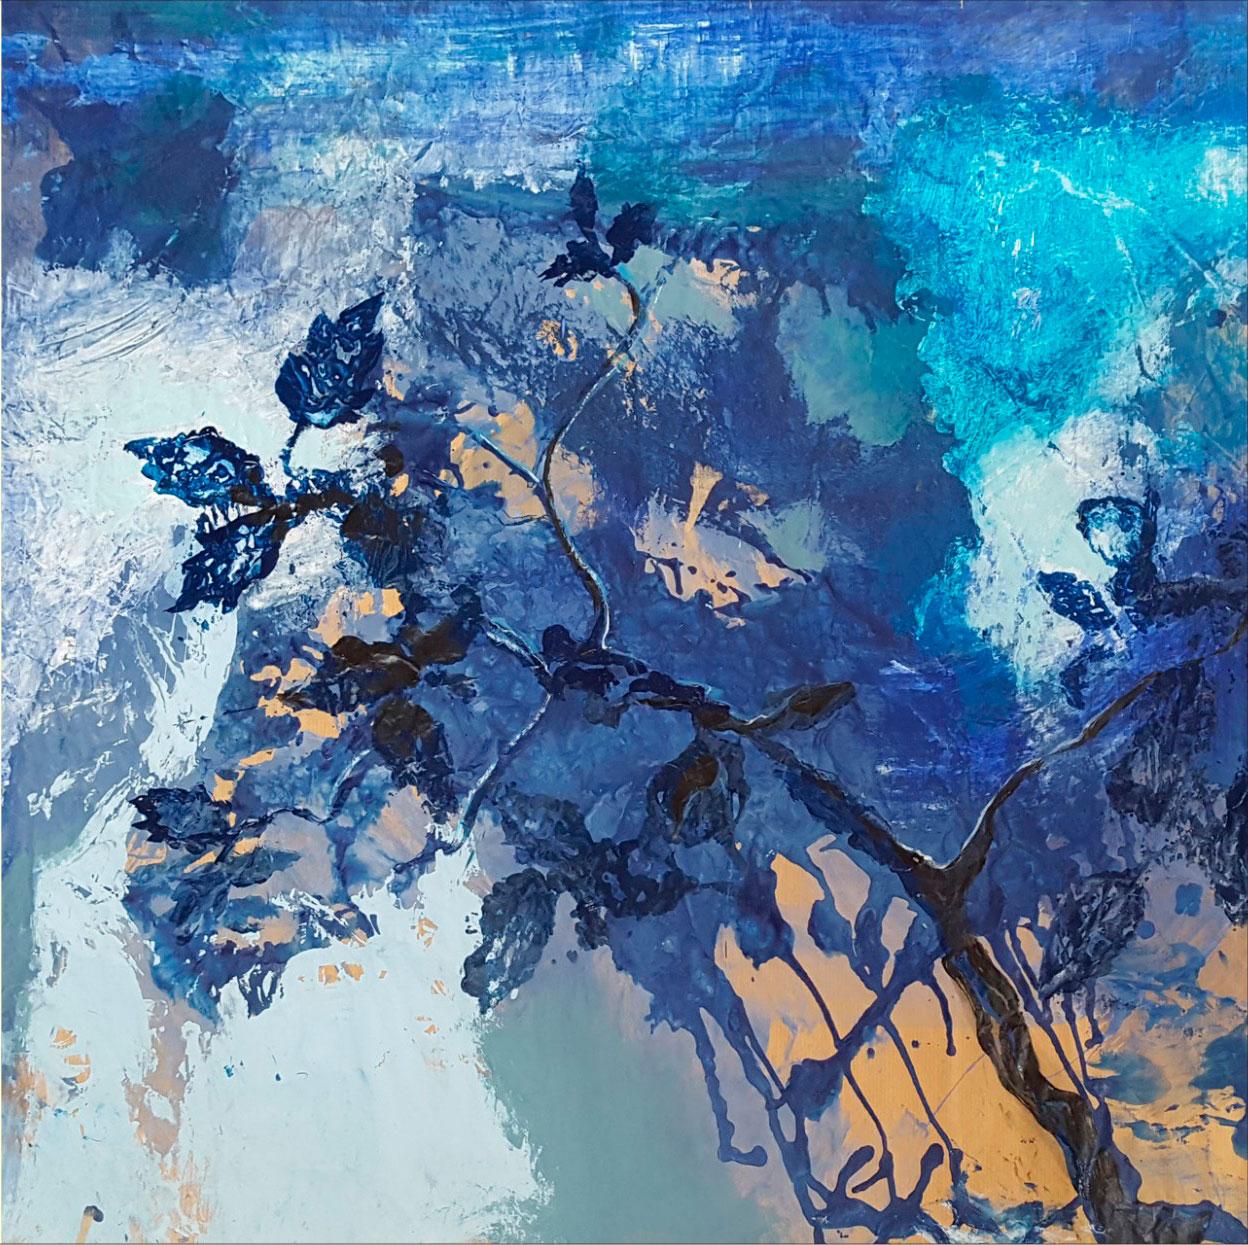 Series Oceánicos Azules n. 13 (2016) - Rufina Santana Vega